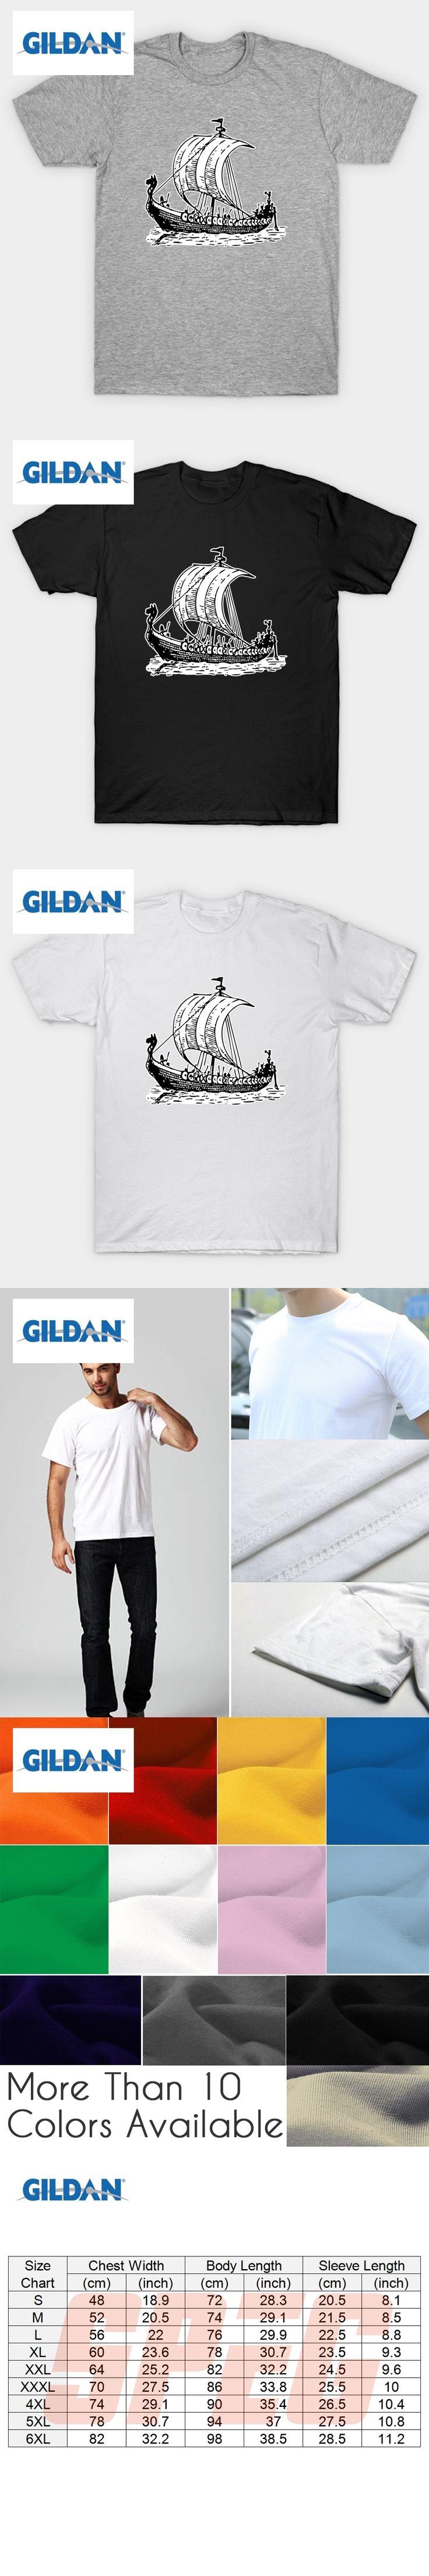 GILDAN Men Tee Shirts Vikings Odin's Ship Boat Valhalla Man Organnic Short Sleeve Tee Shirts New Style Man Men's Formal Shirts